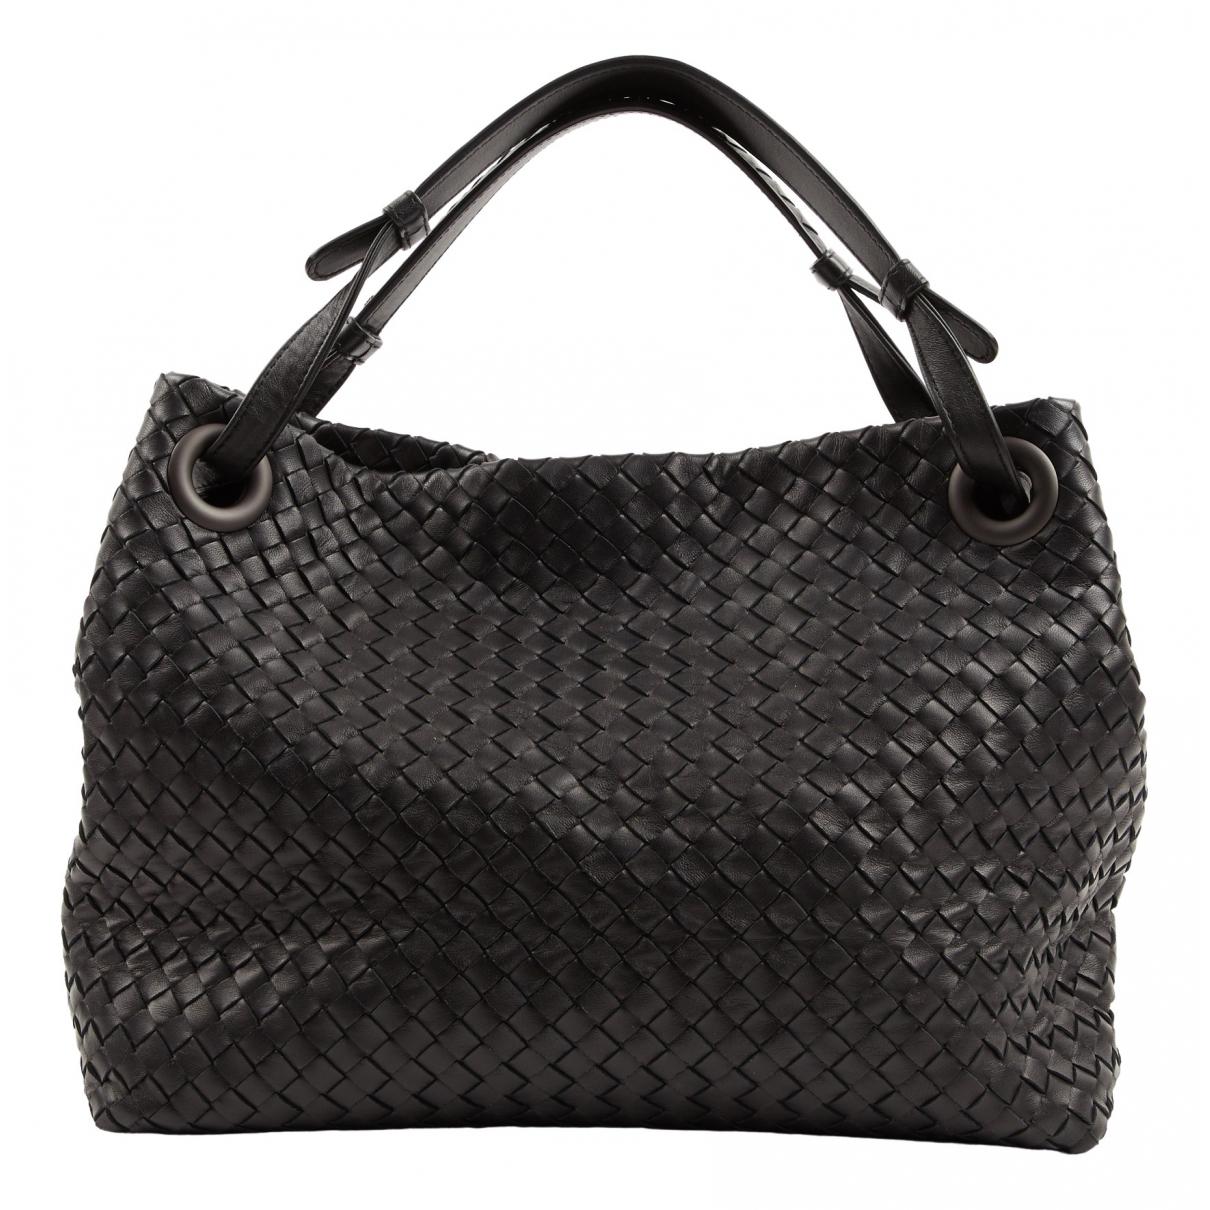 Bottega Veneta - Sac a main Garda pour femme en cuir - noir